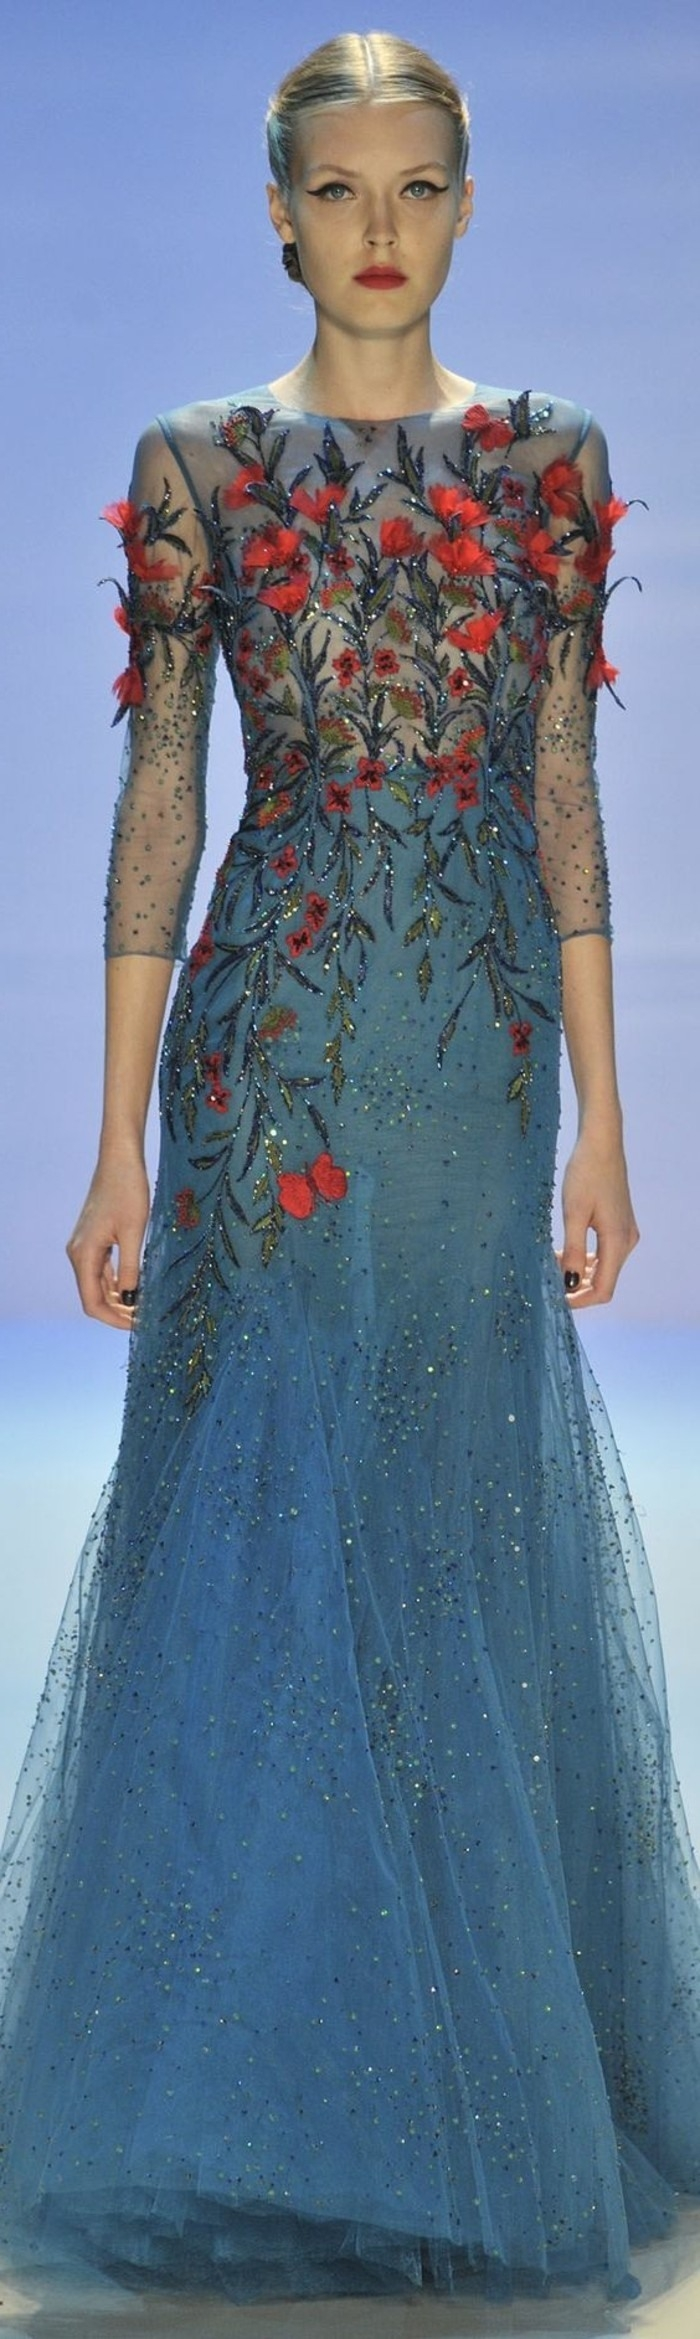 20 Wunderbar Elegantes Kleid Mit Ärmel Stylish Elegant Elegantes Kleid Mit Ärmel Spezialgebiet